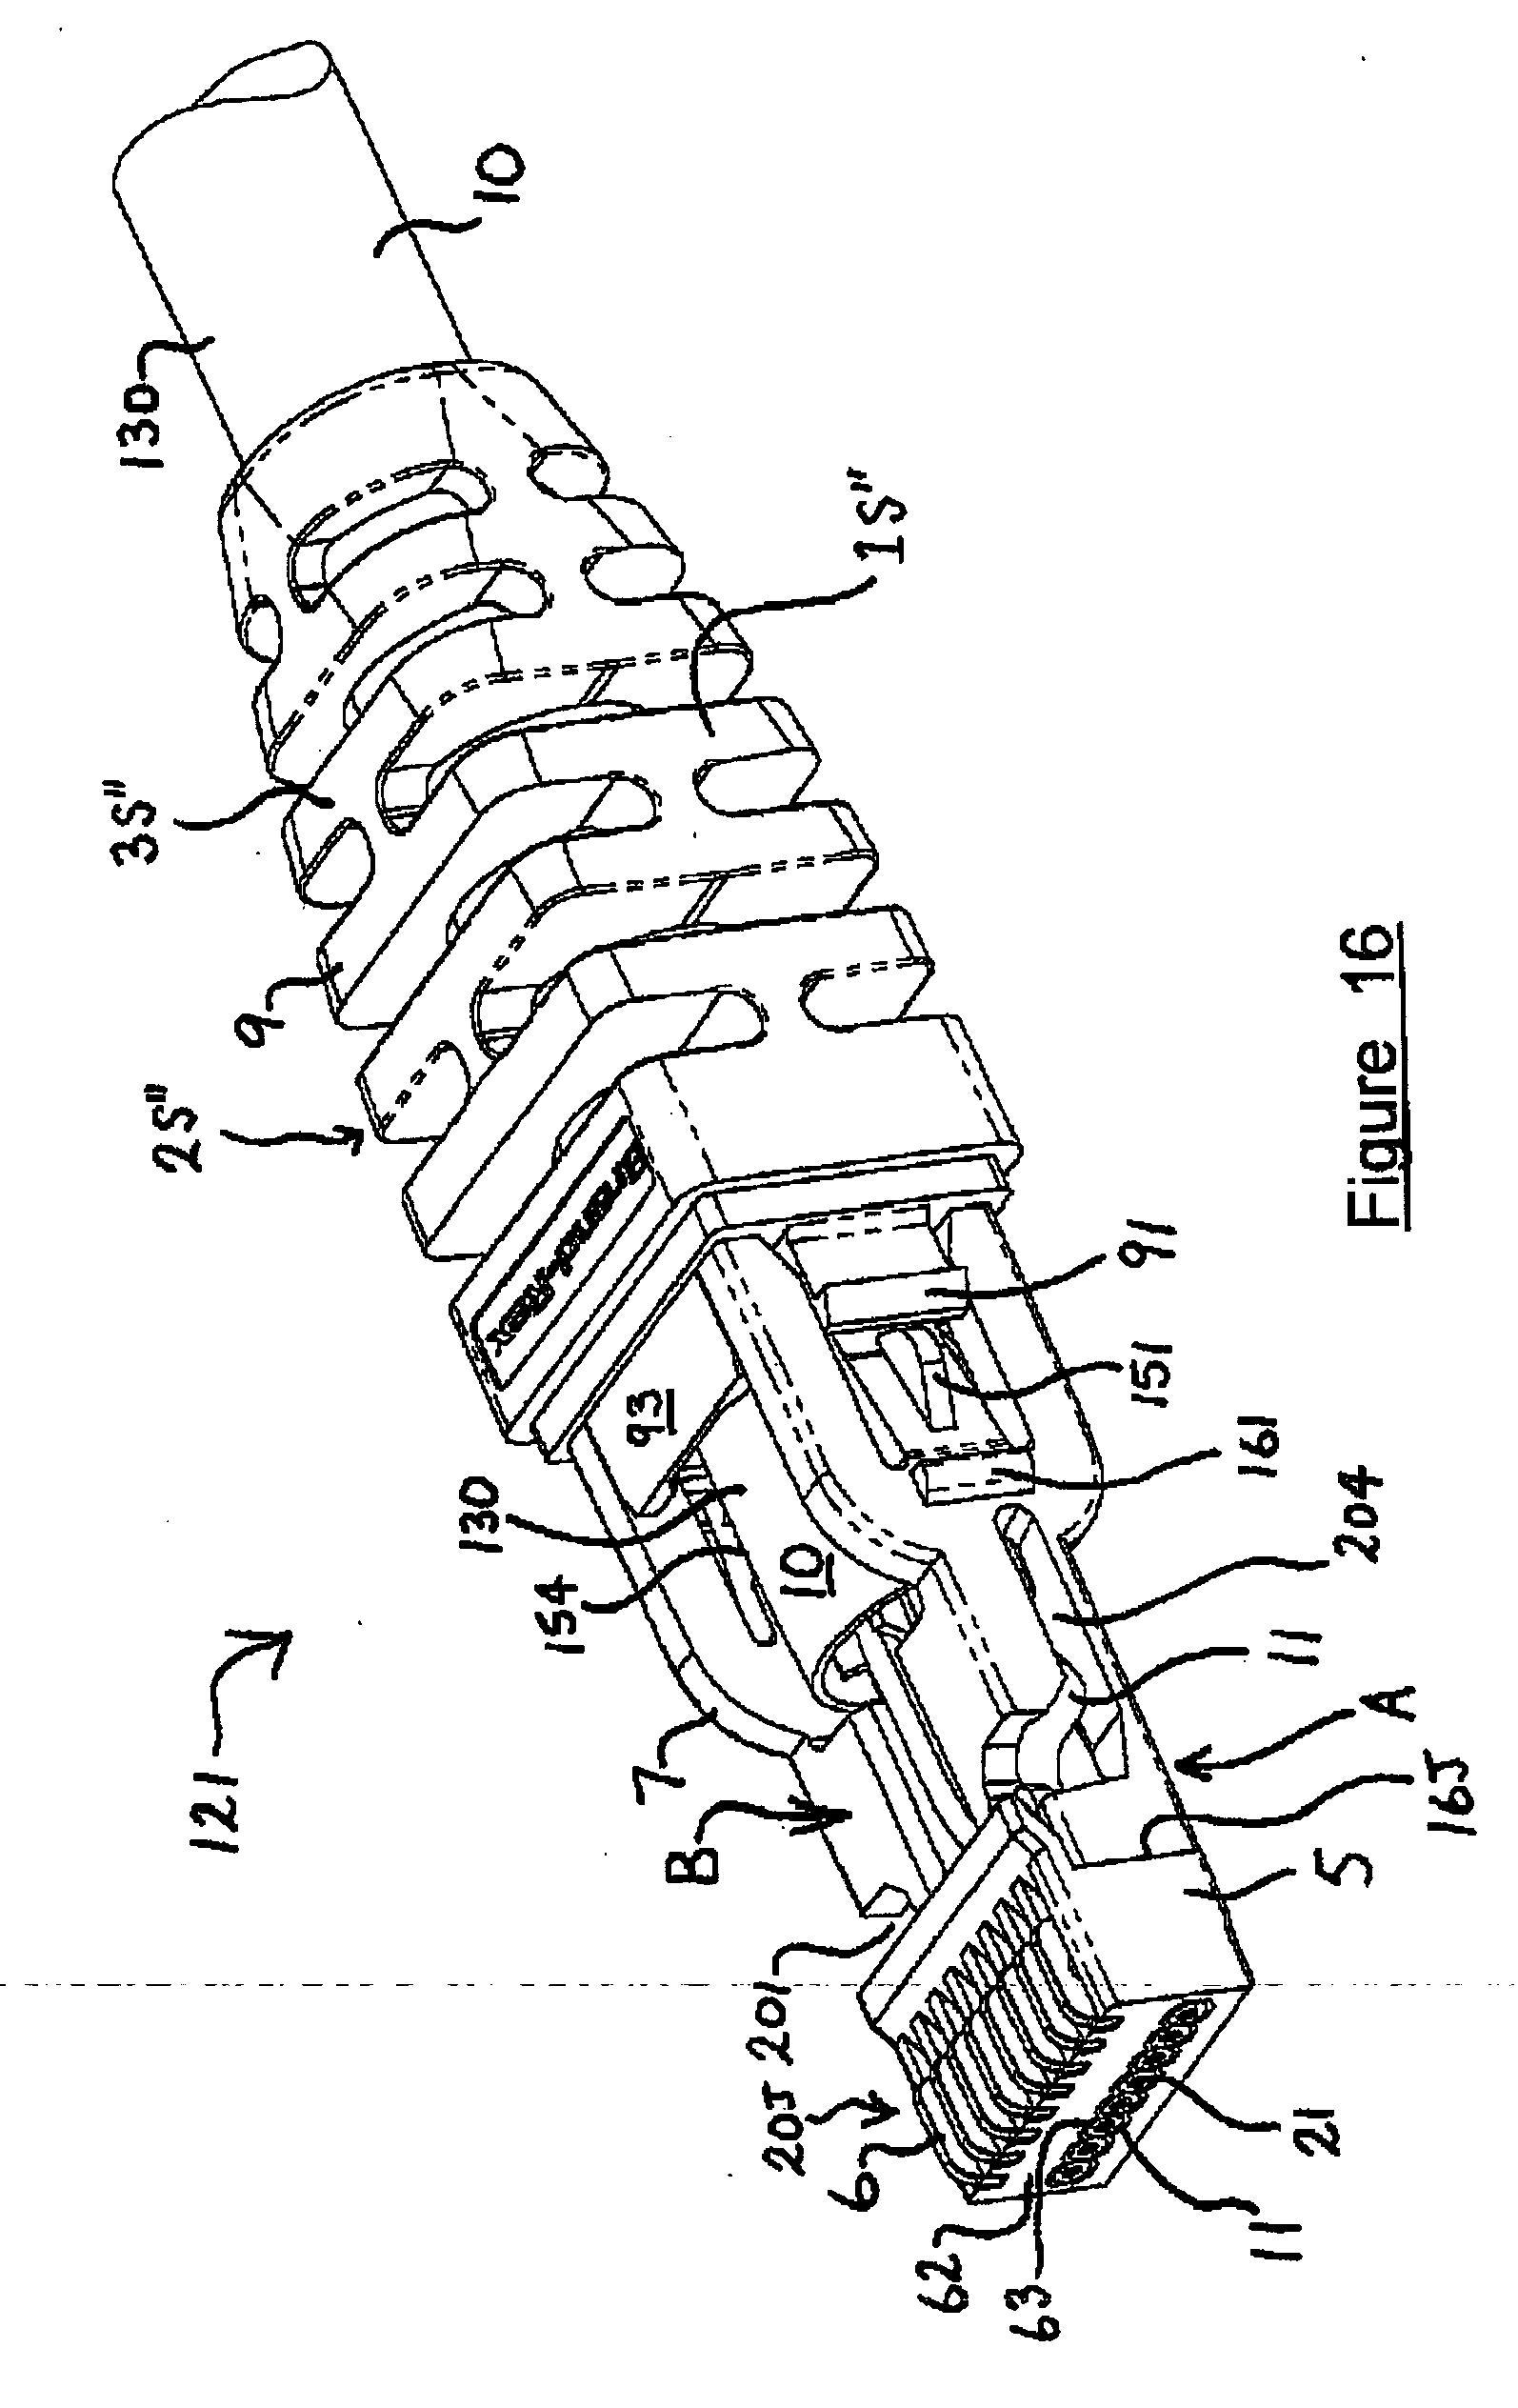 Attractive leviton cat5e wiring diagram embellishment wiring